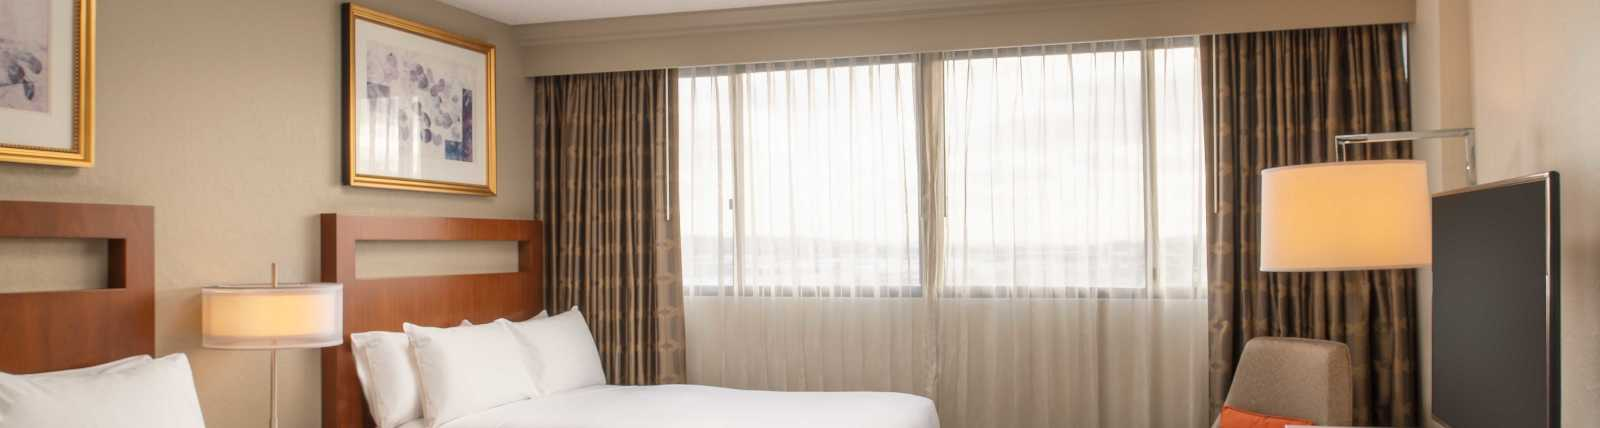 Double Bed Suites